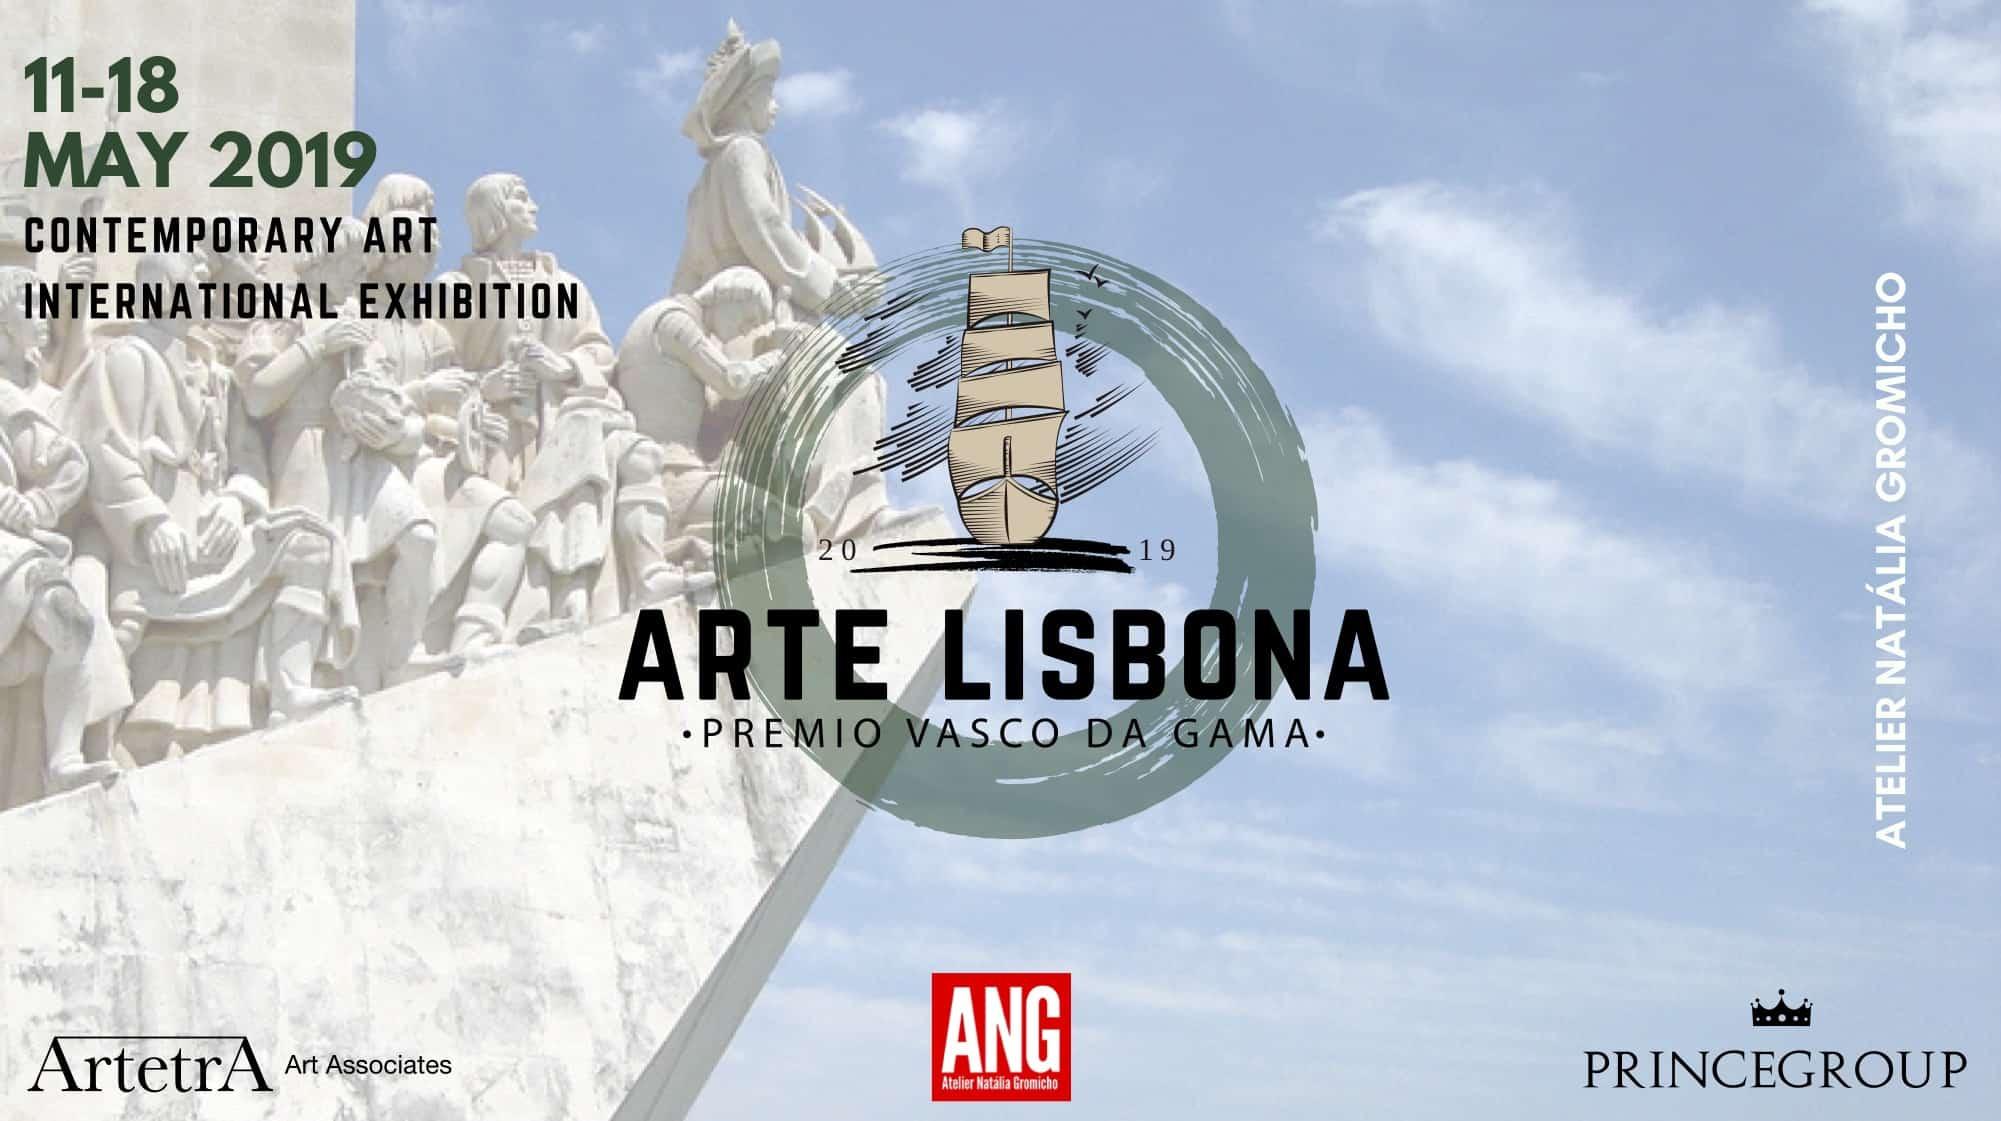 ARTE LISBONA 2019 – PRÉMIO VASCO DA GAMA | ATELIER NATÁLIA GROMICHO